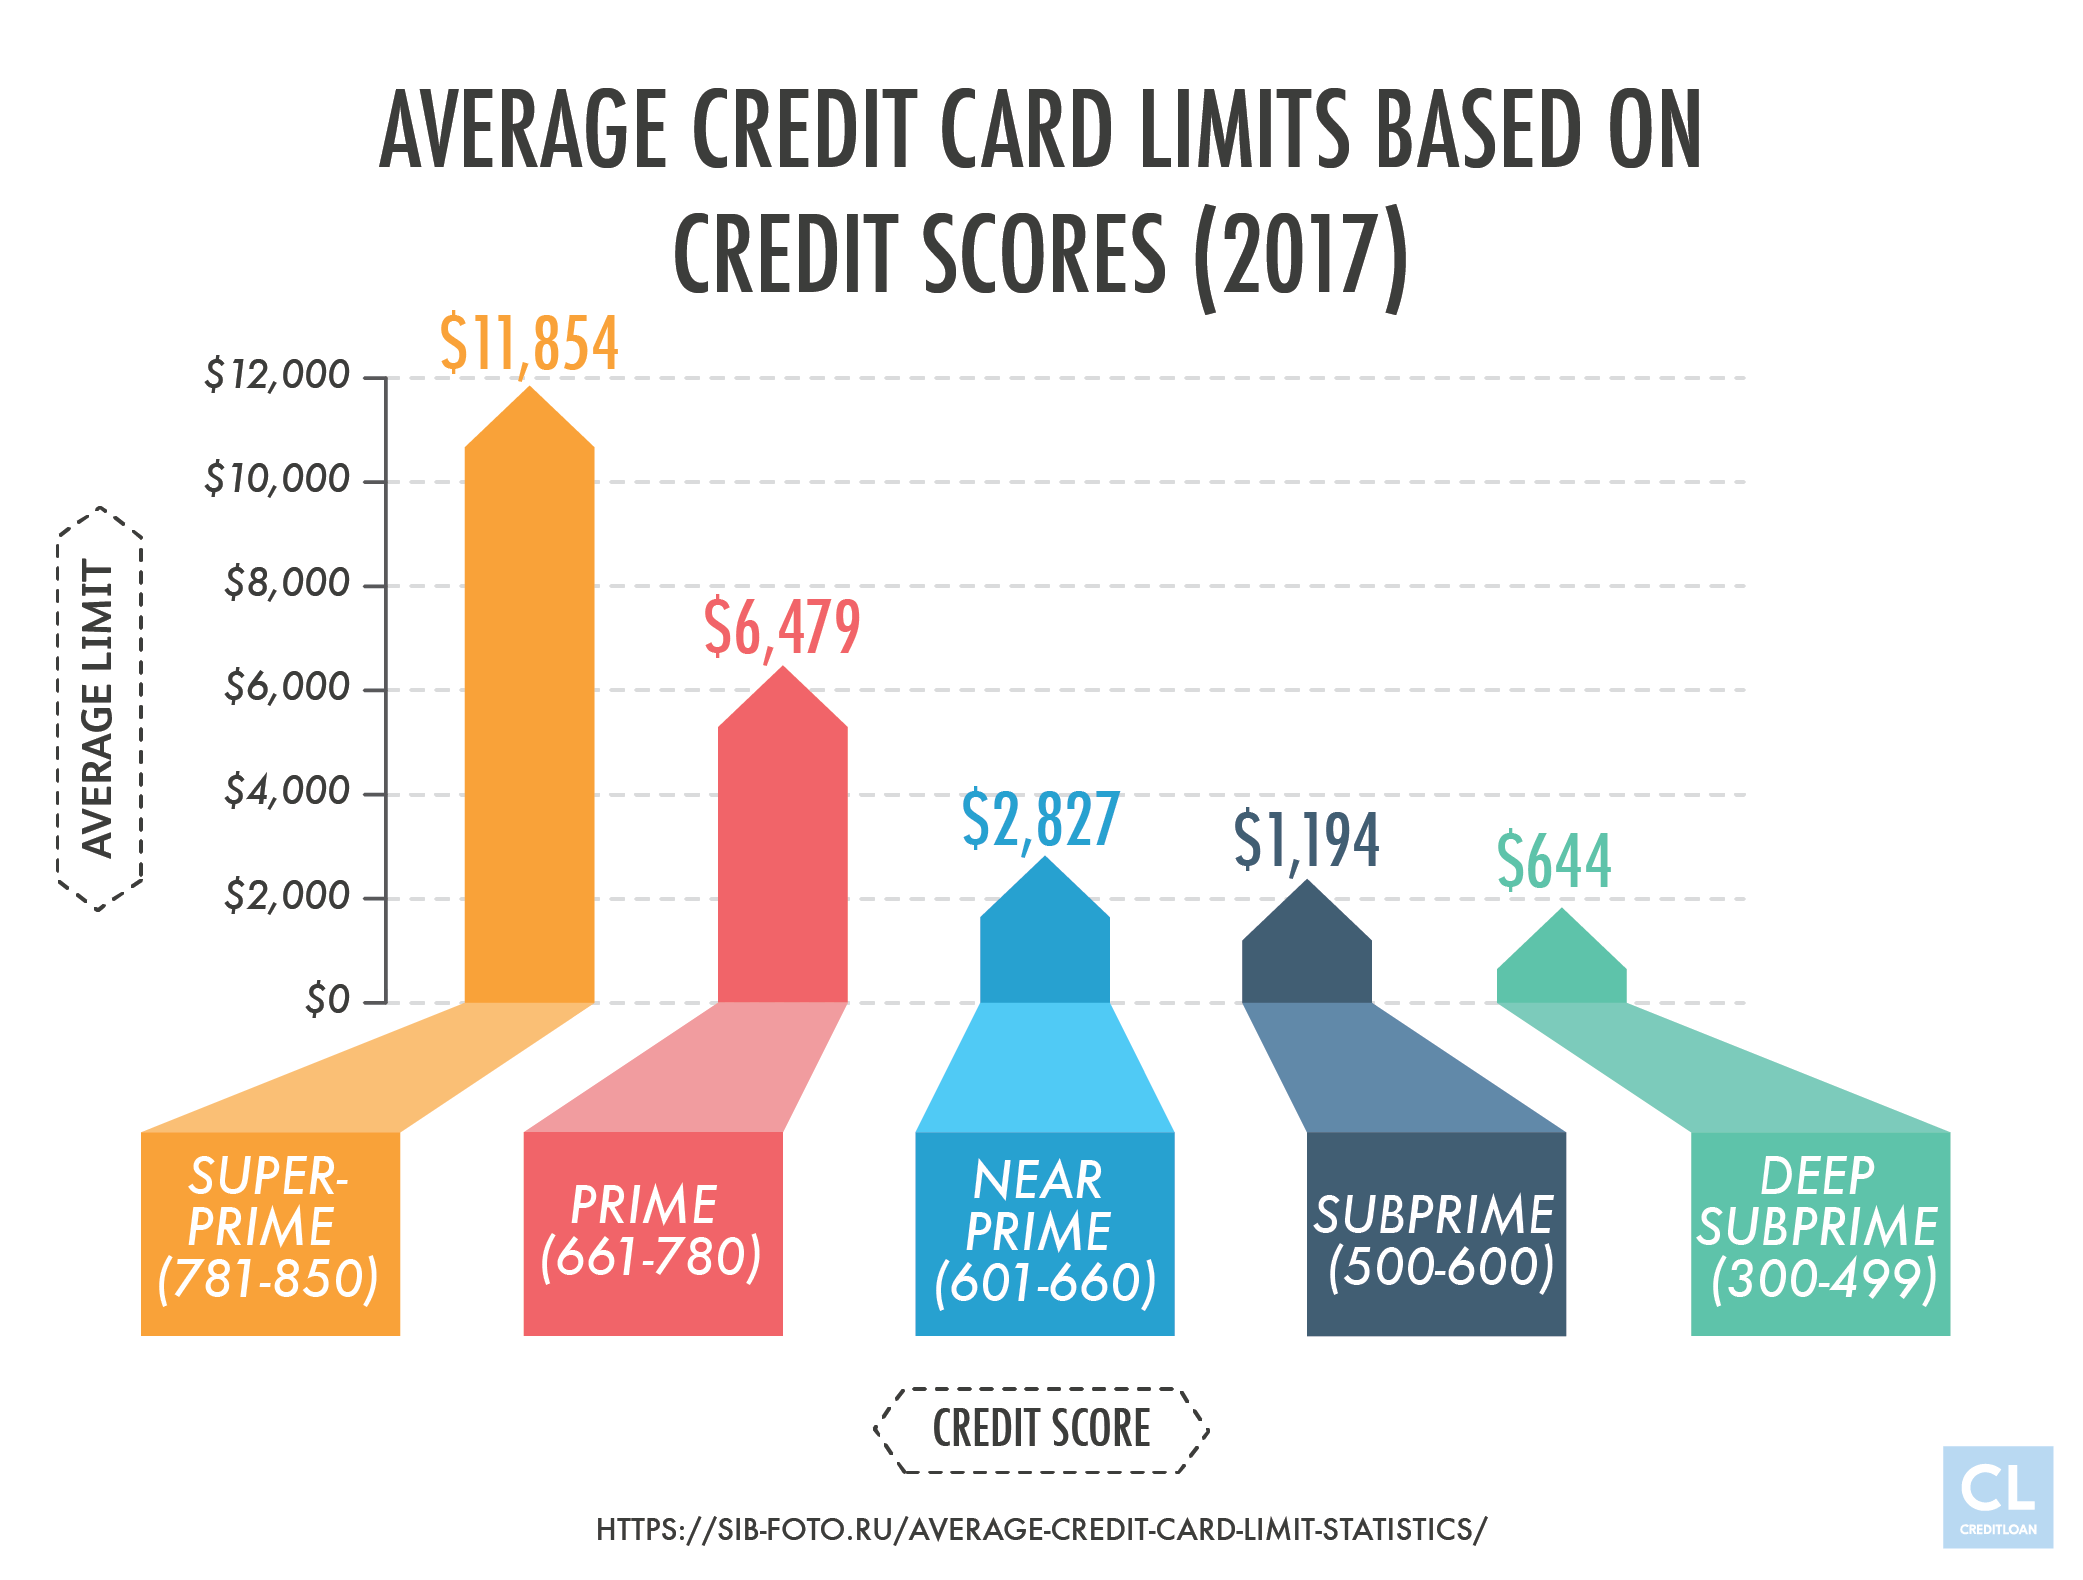 Average Credit Card Limits Based on Credit Scores (2017)